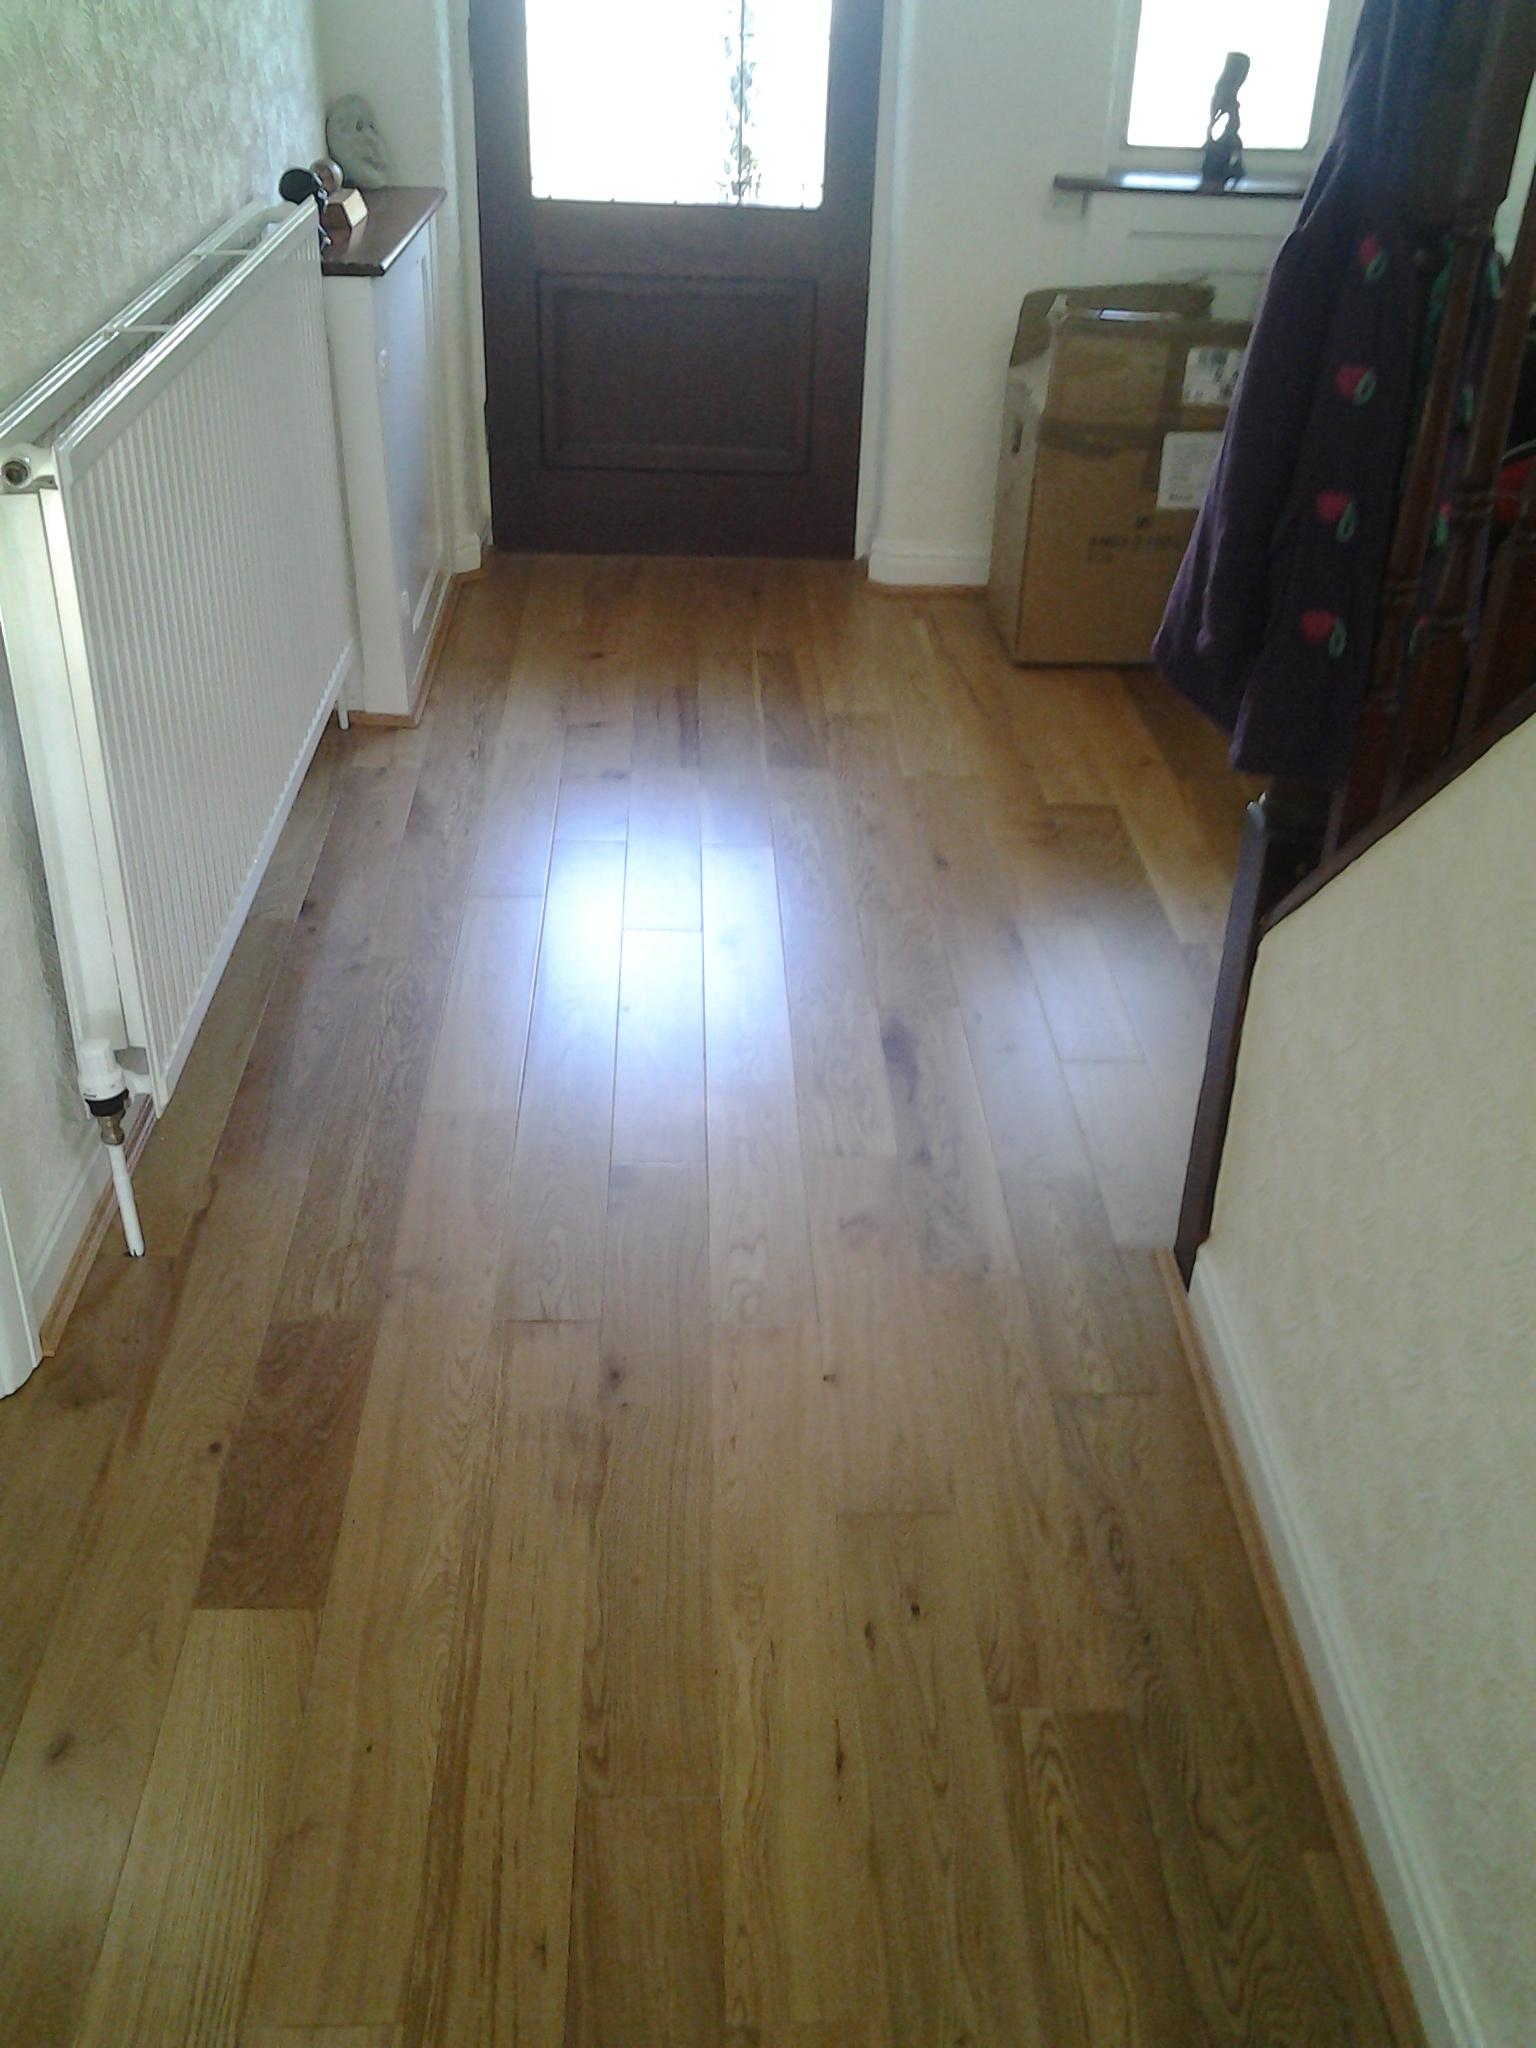 Stockport Construction – Flooring - 08